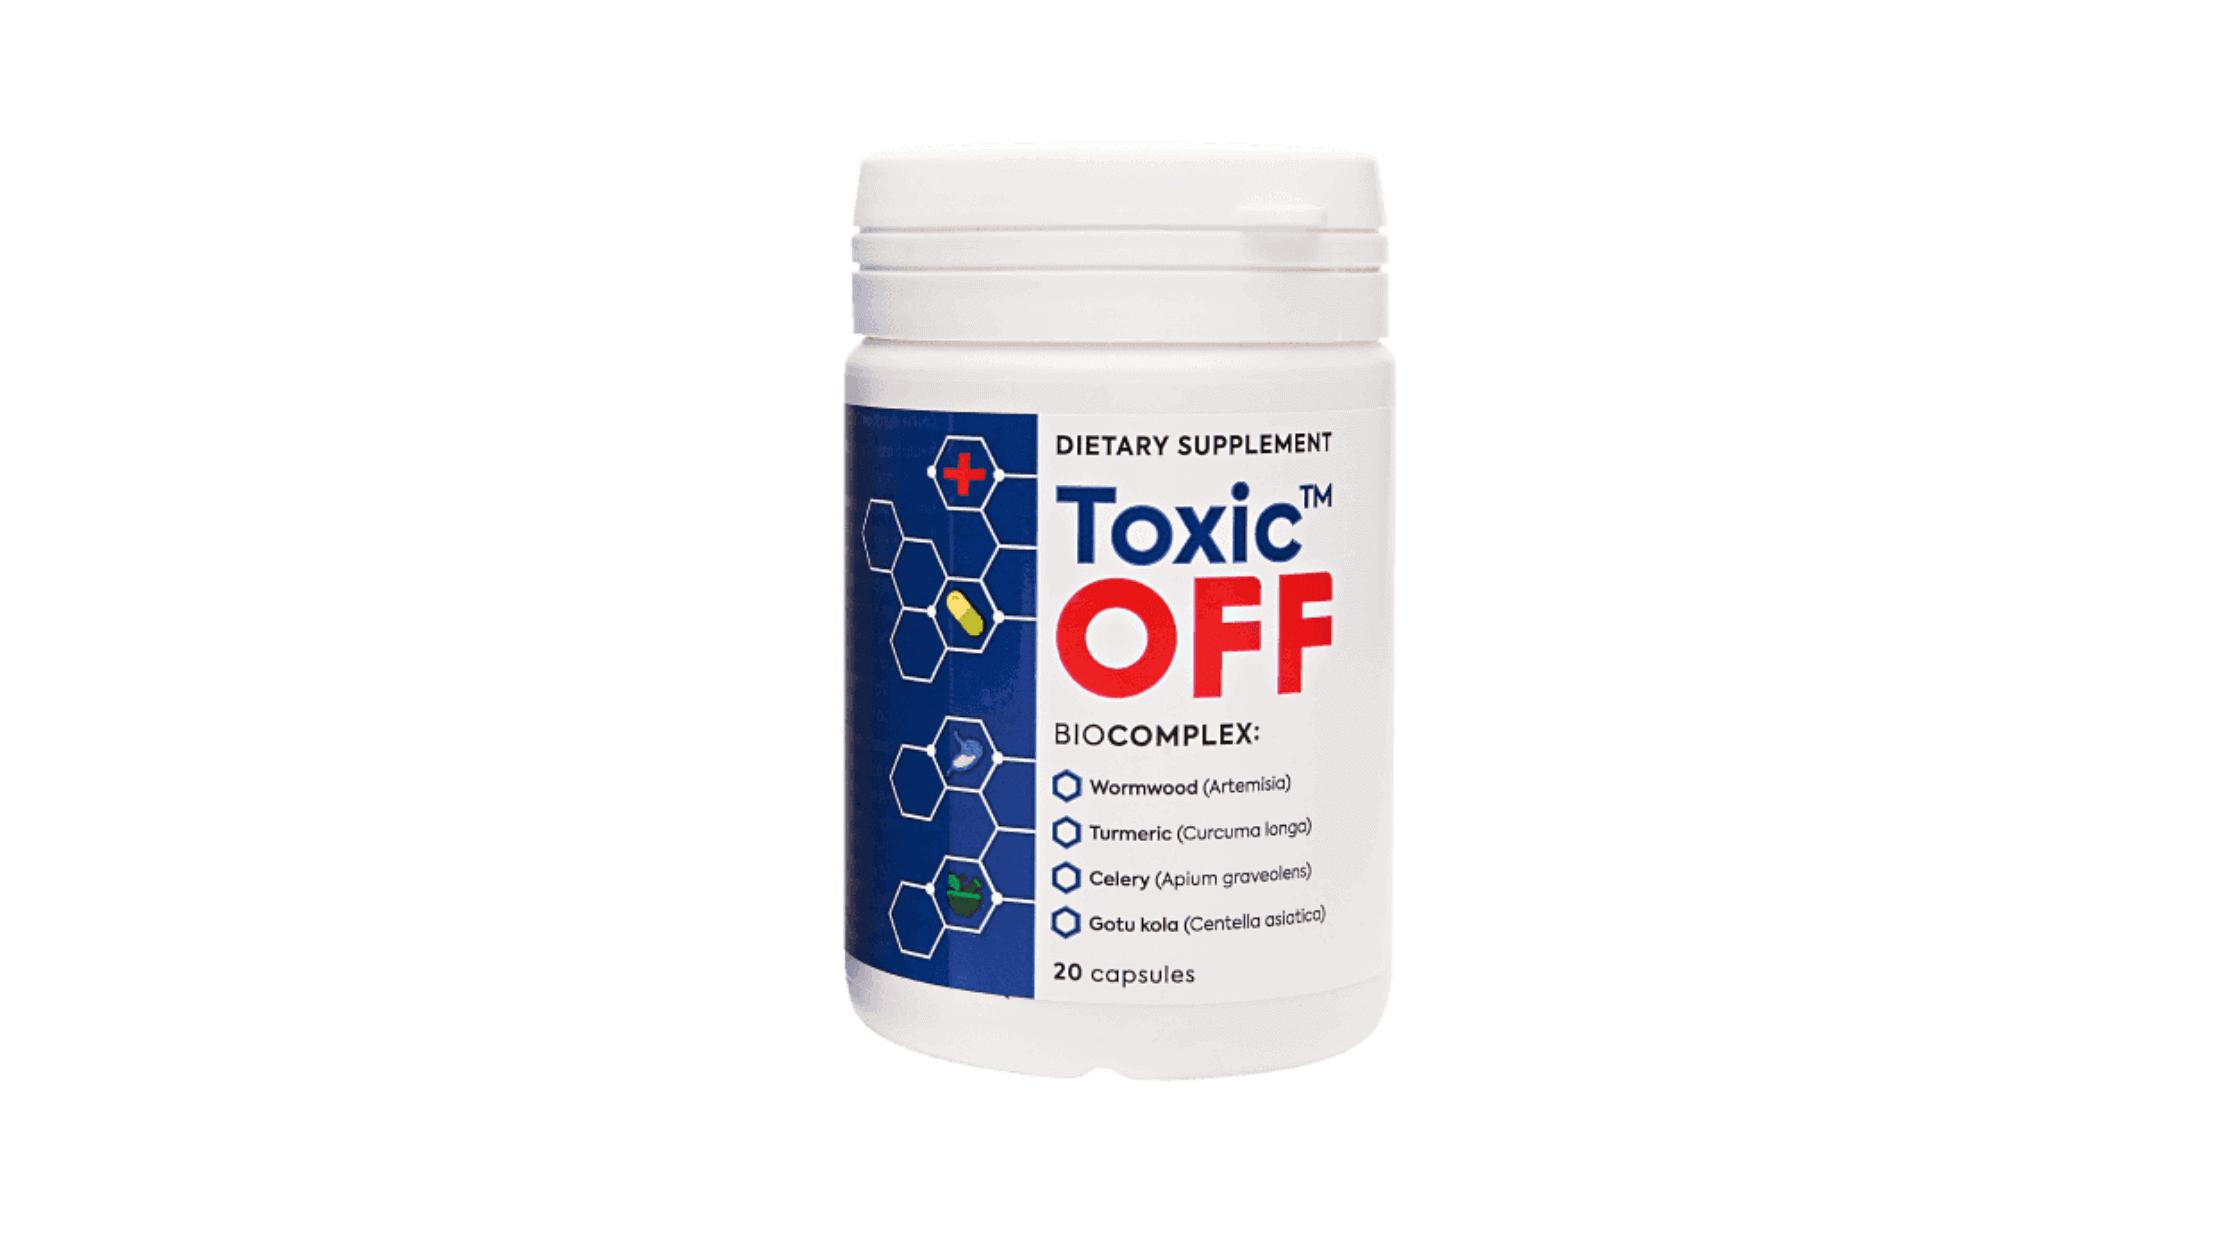 Toxic OFF Reviews